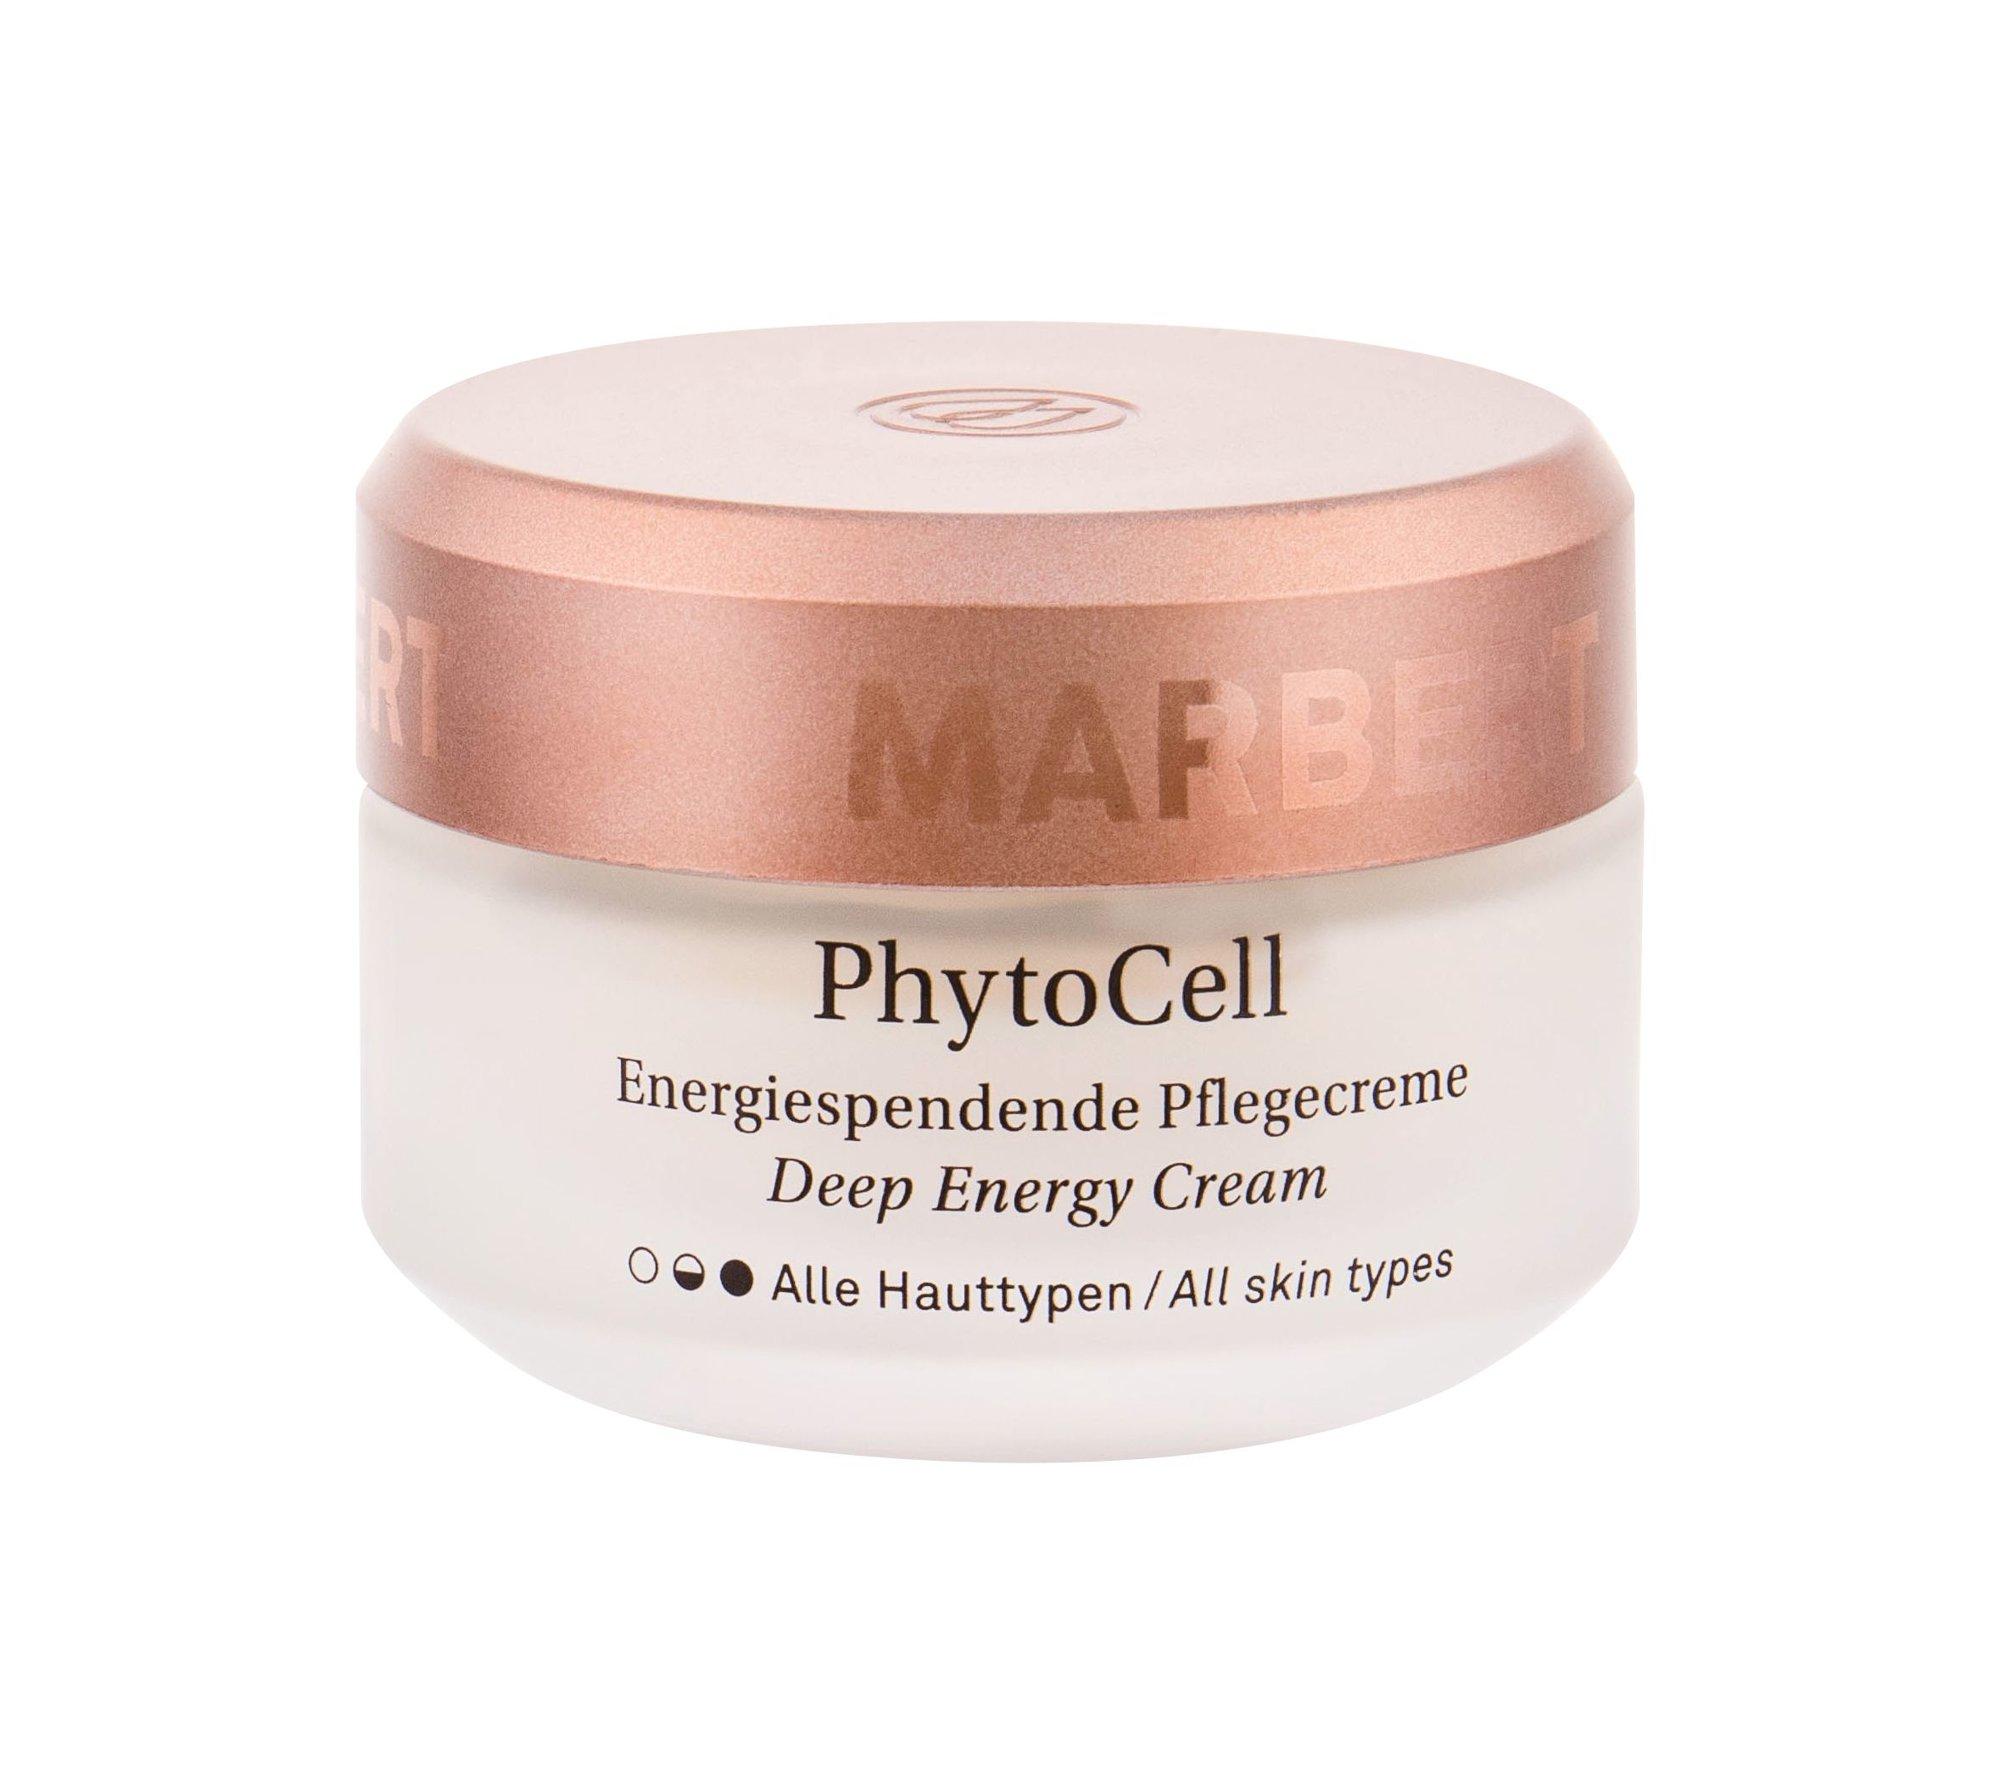 Marbert Anti-Aging Care Day Cream 50ml  PhytoCell